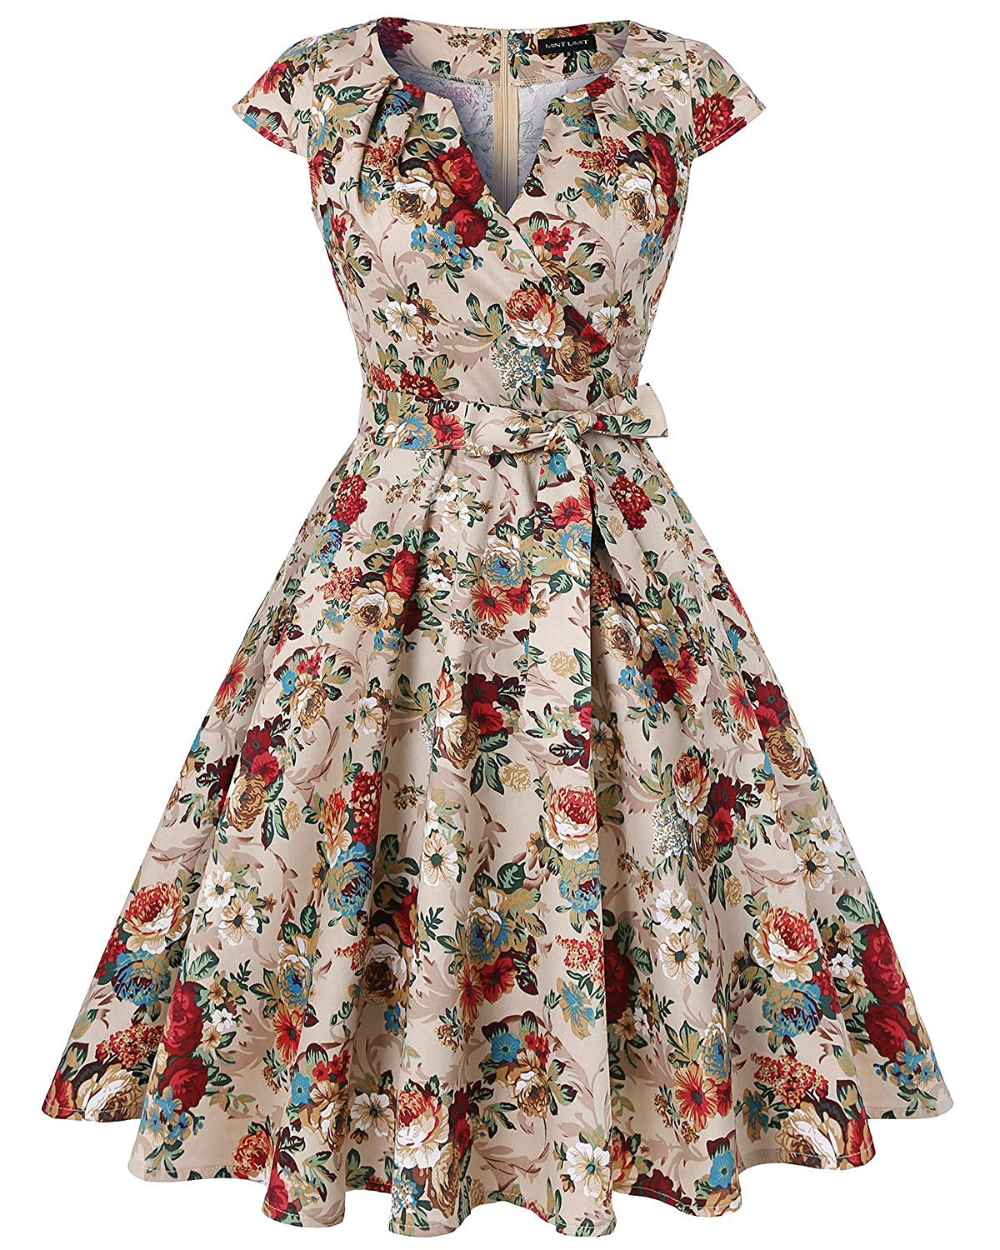 Mintlimit Women S Vintage 1950s Retro Cap Sleeves V Neck Rockabilly Swing Cocktail Dresses With Vintage Swing Dress Cocktail Dress Vintage 50s Fashion Dresses [ 1250 x 1000 Pixel ]